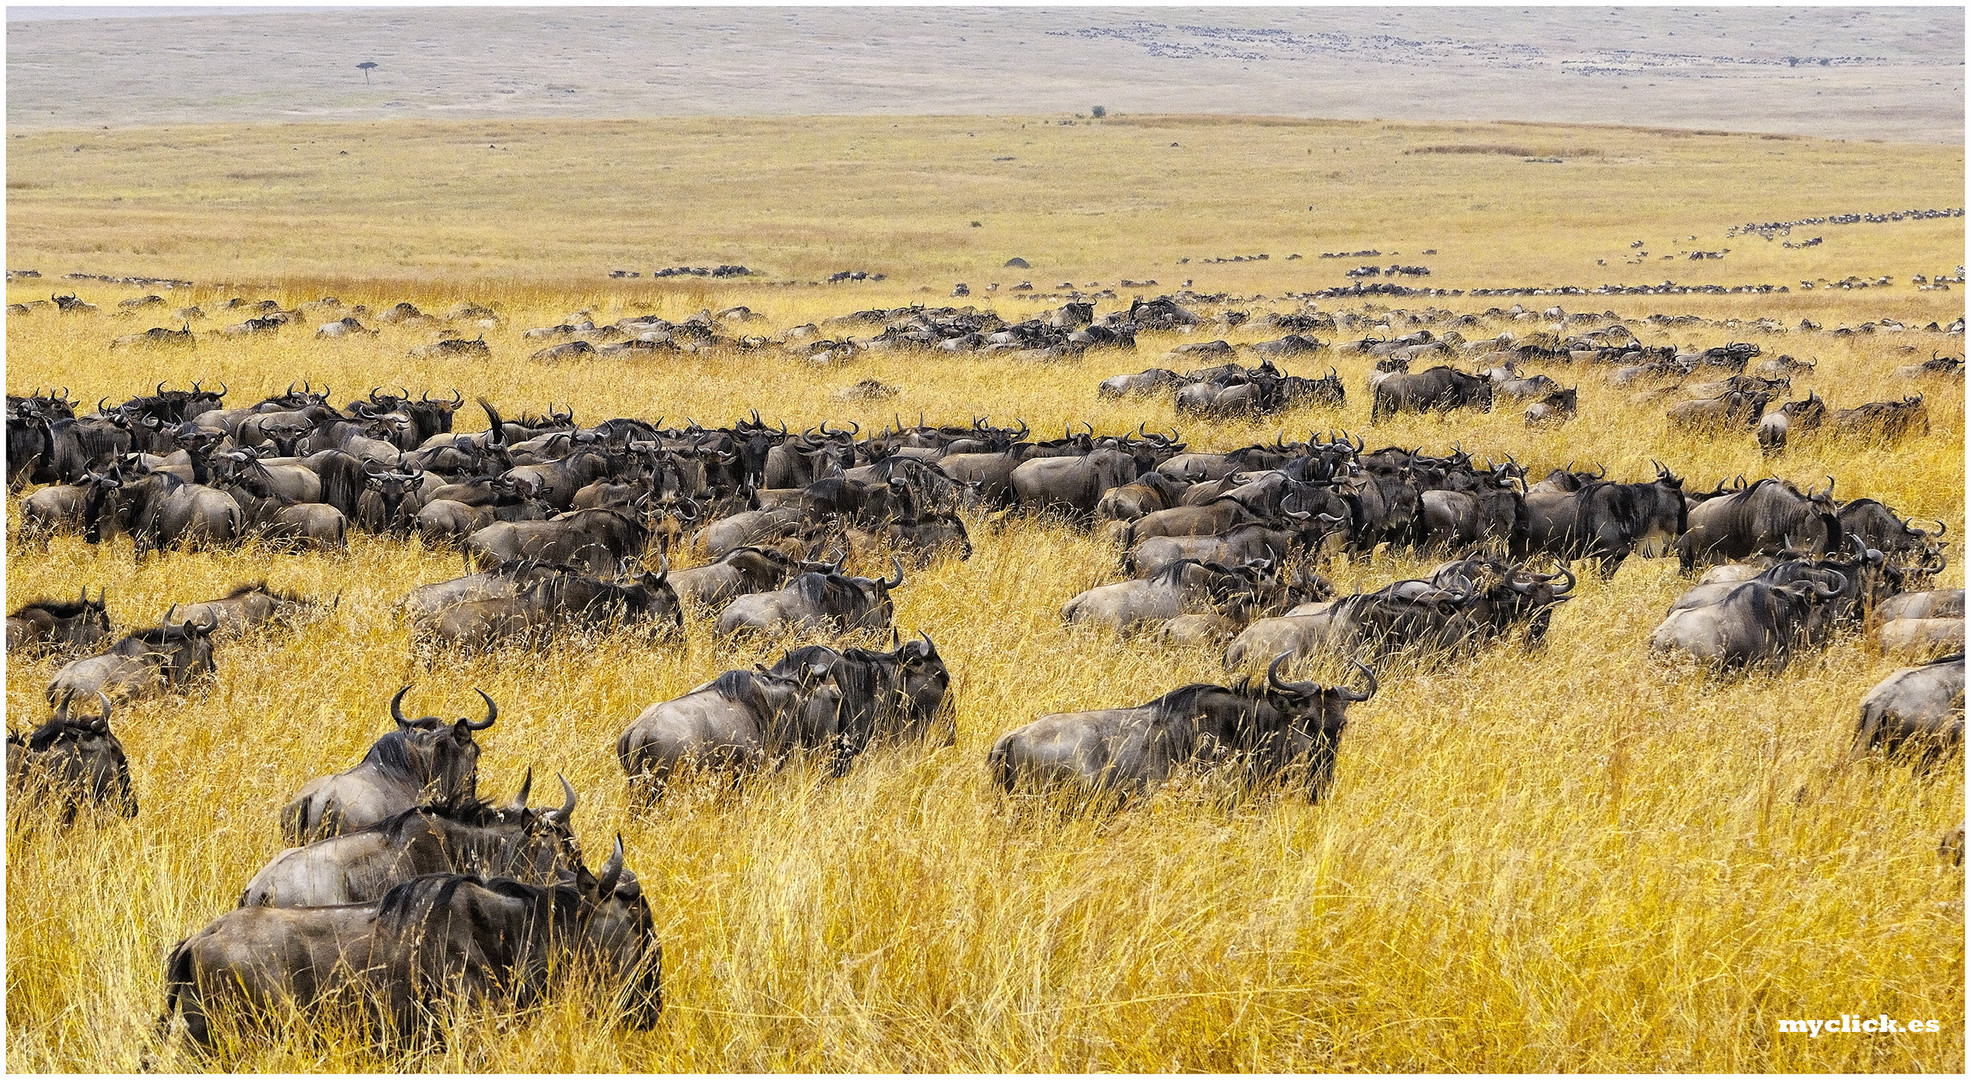 MEMORIAS DE AFRICA -LA TARDE QUE LLEGUE AL MARA -PN MASAI-MARA KENIA